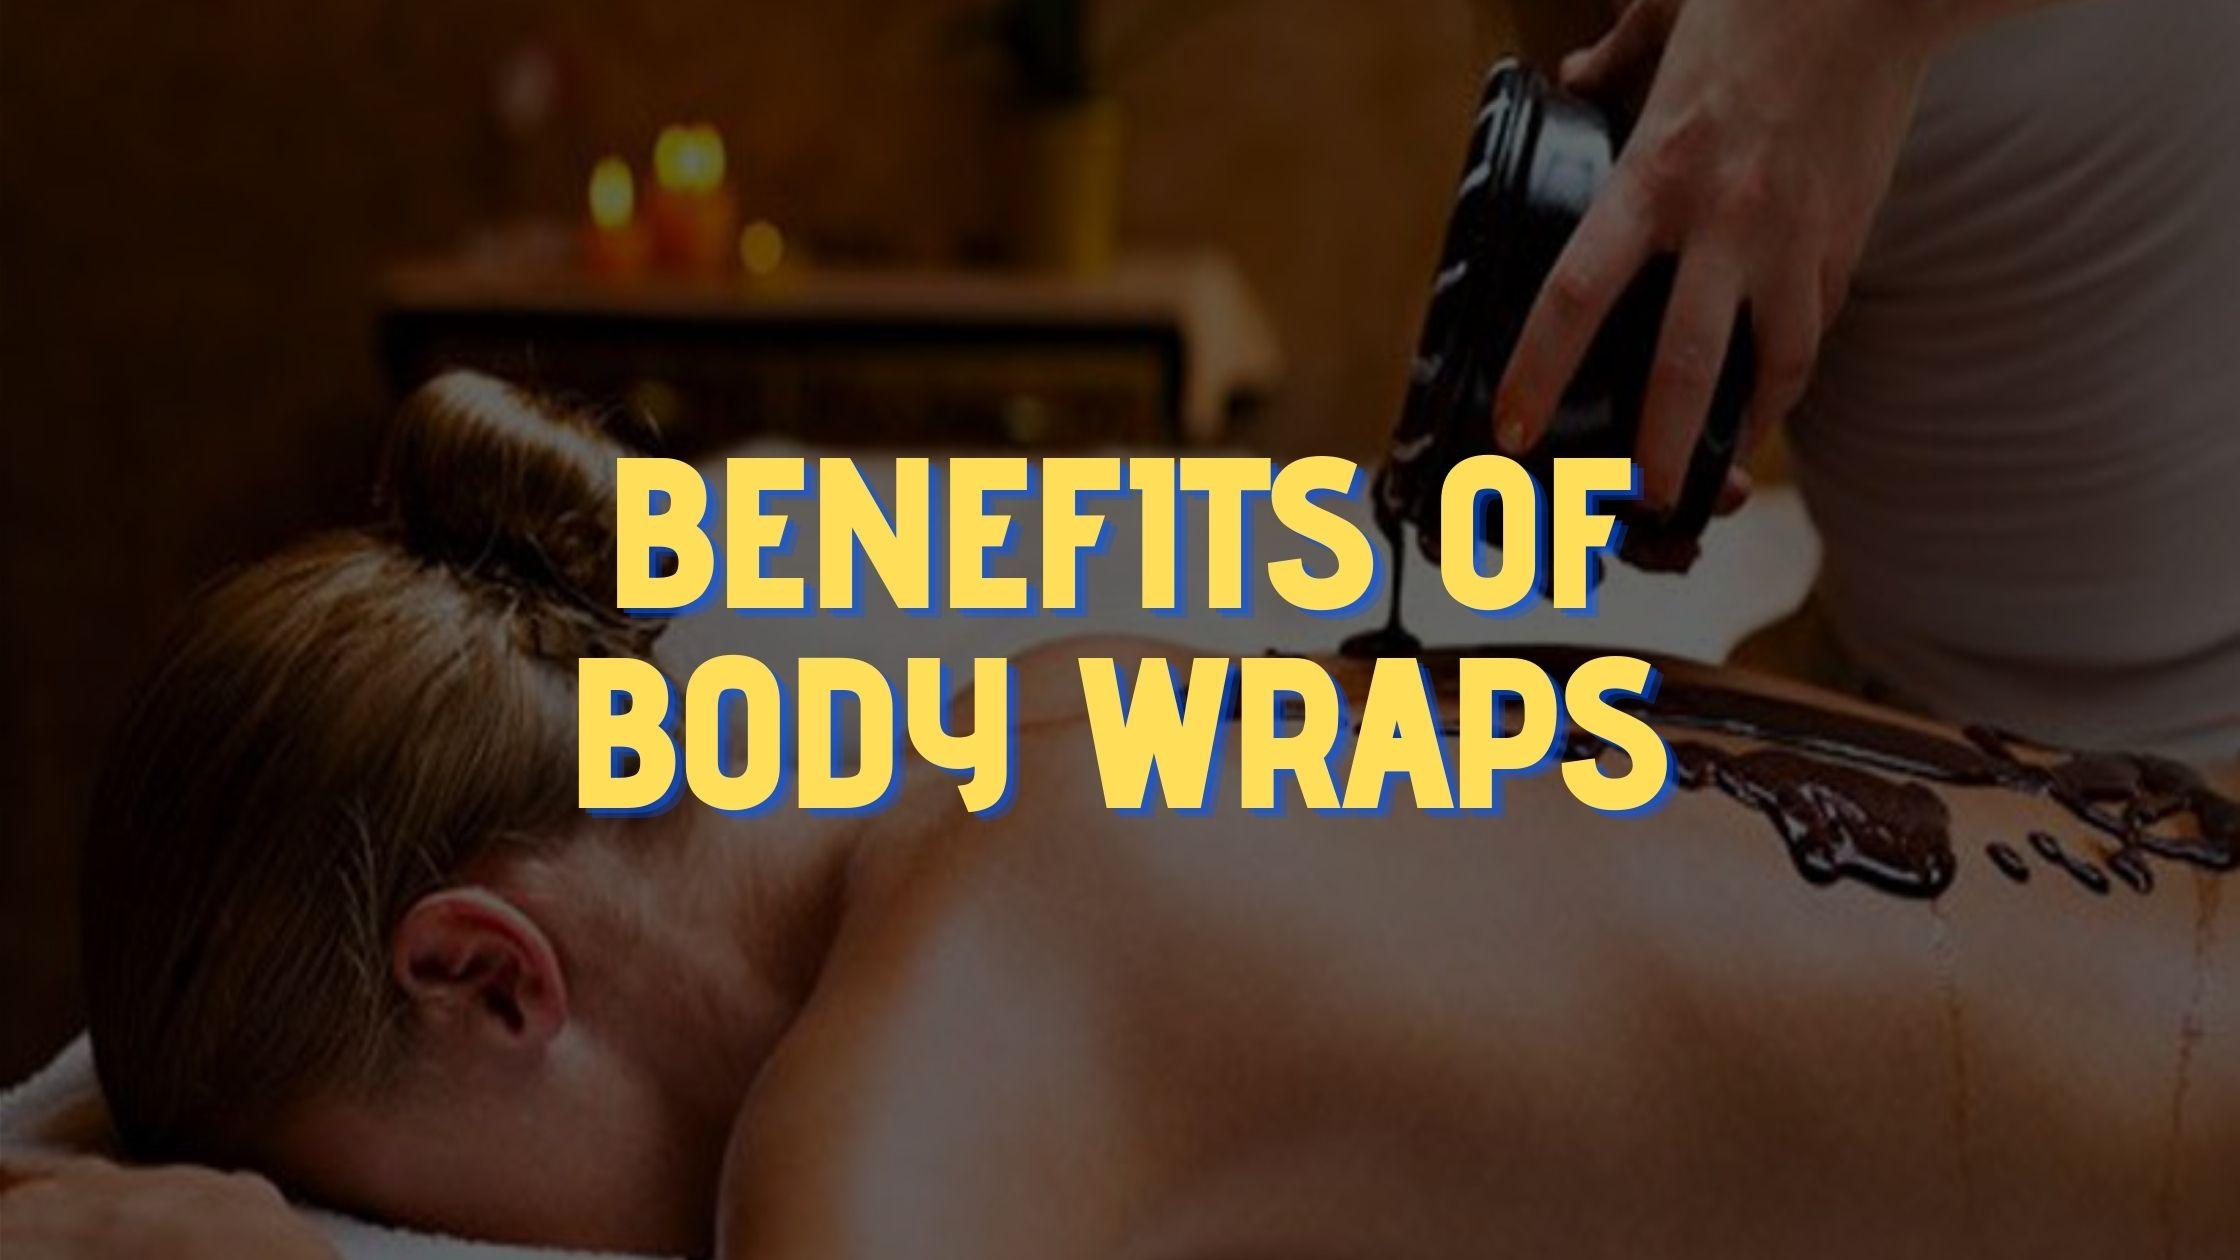 Benefits of Body Wraps